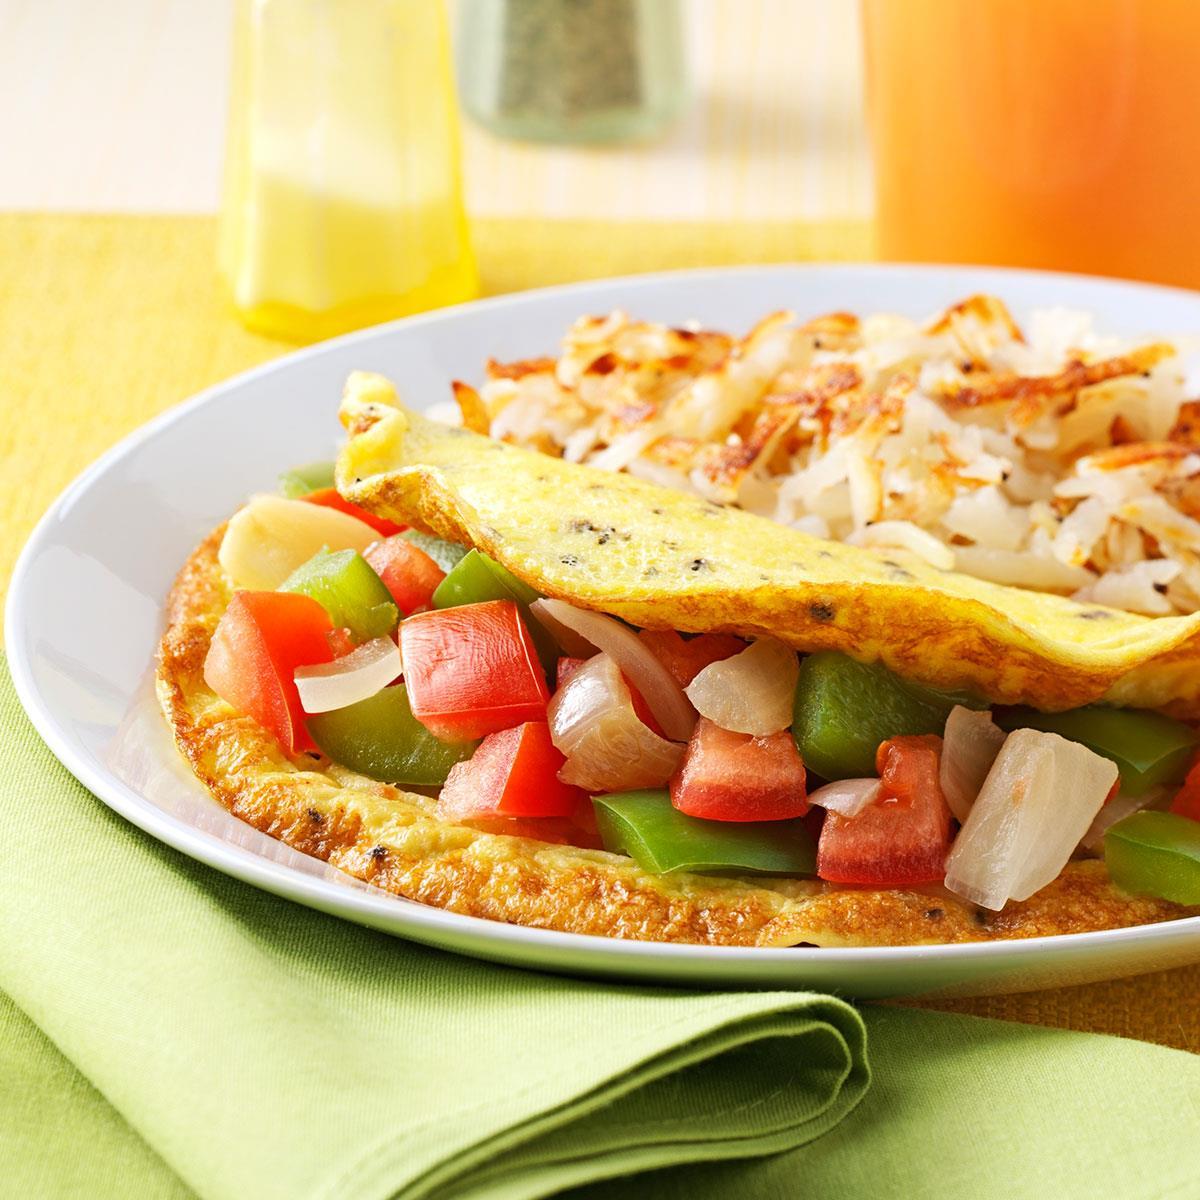 Ideje za doručak: Omlet s paprikom